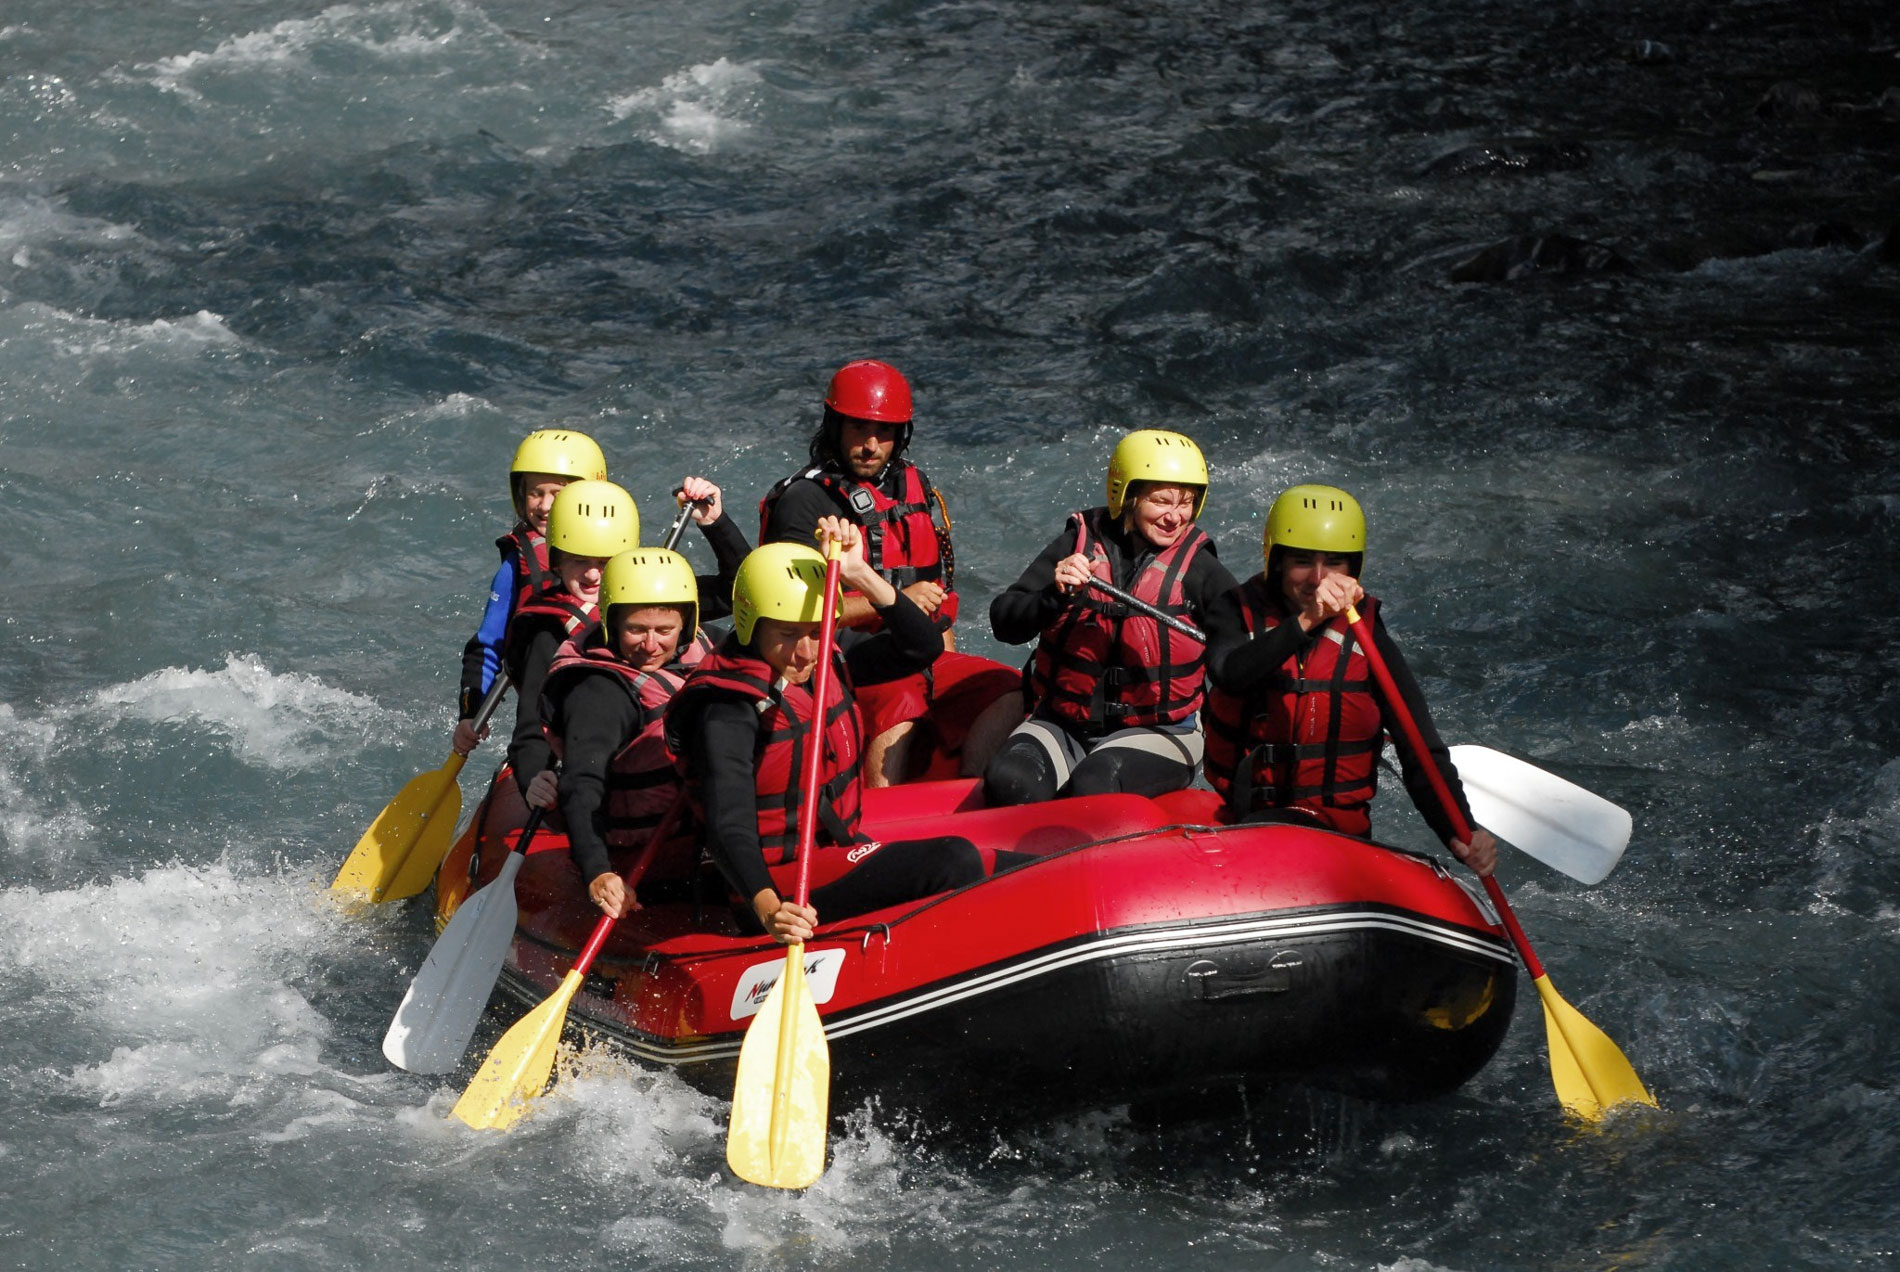 nunayak rafting alpes - rafting haute savoie - rafting canyoning